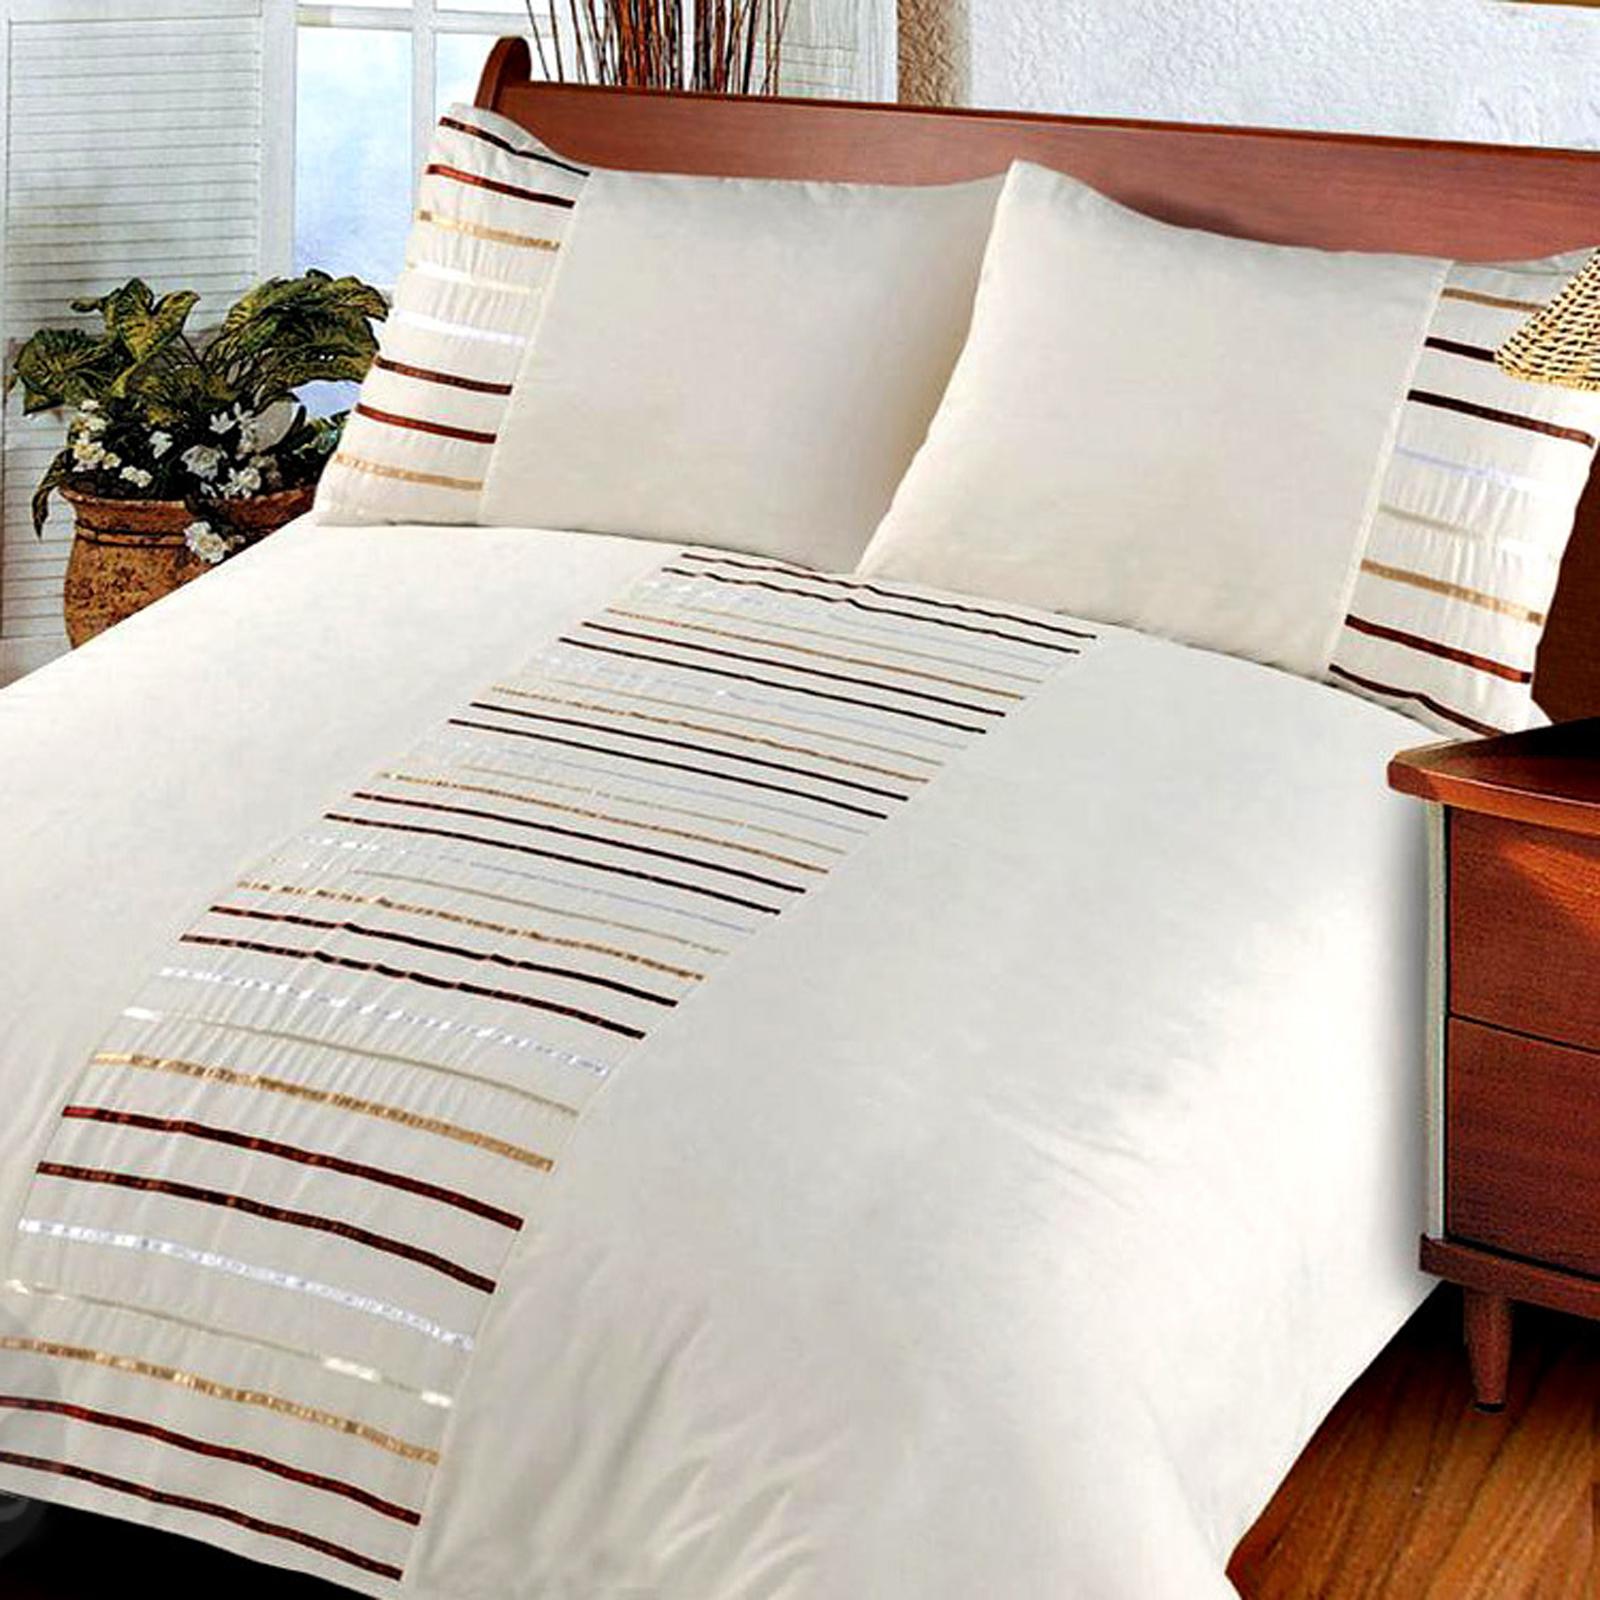 Modern quilt bedding - Modern Striped Duvet Cover Set Bedding Quilt Cover